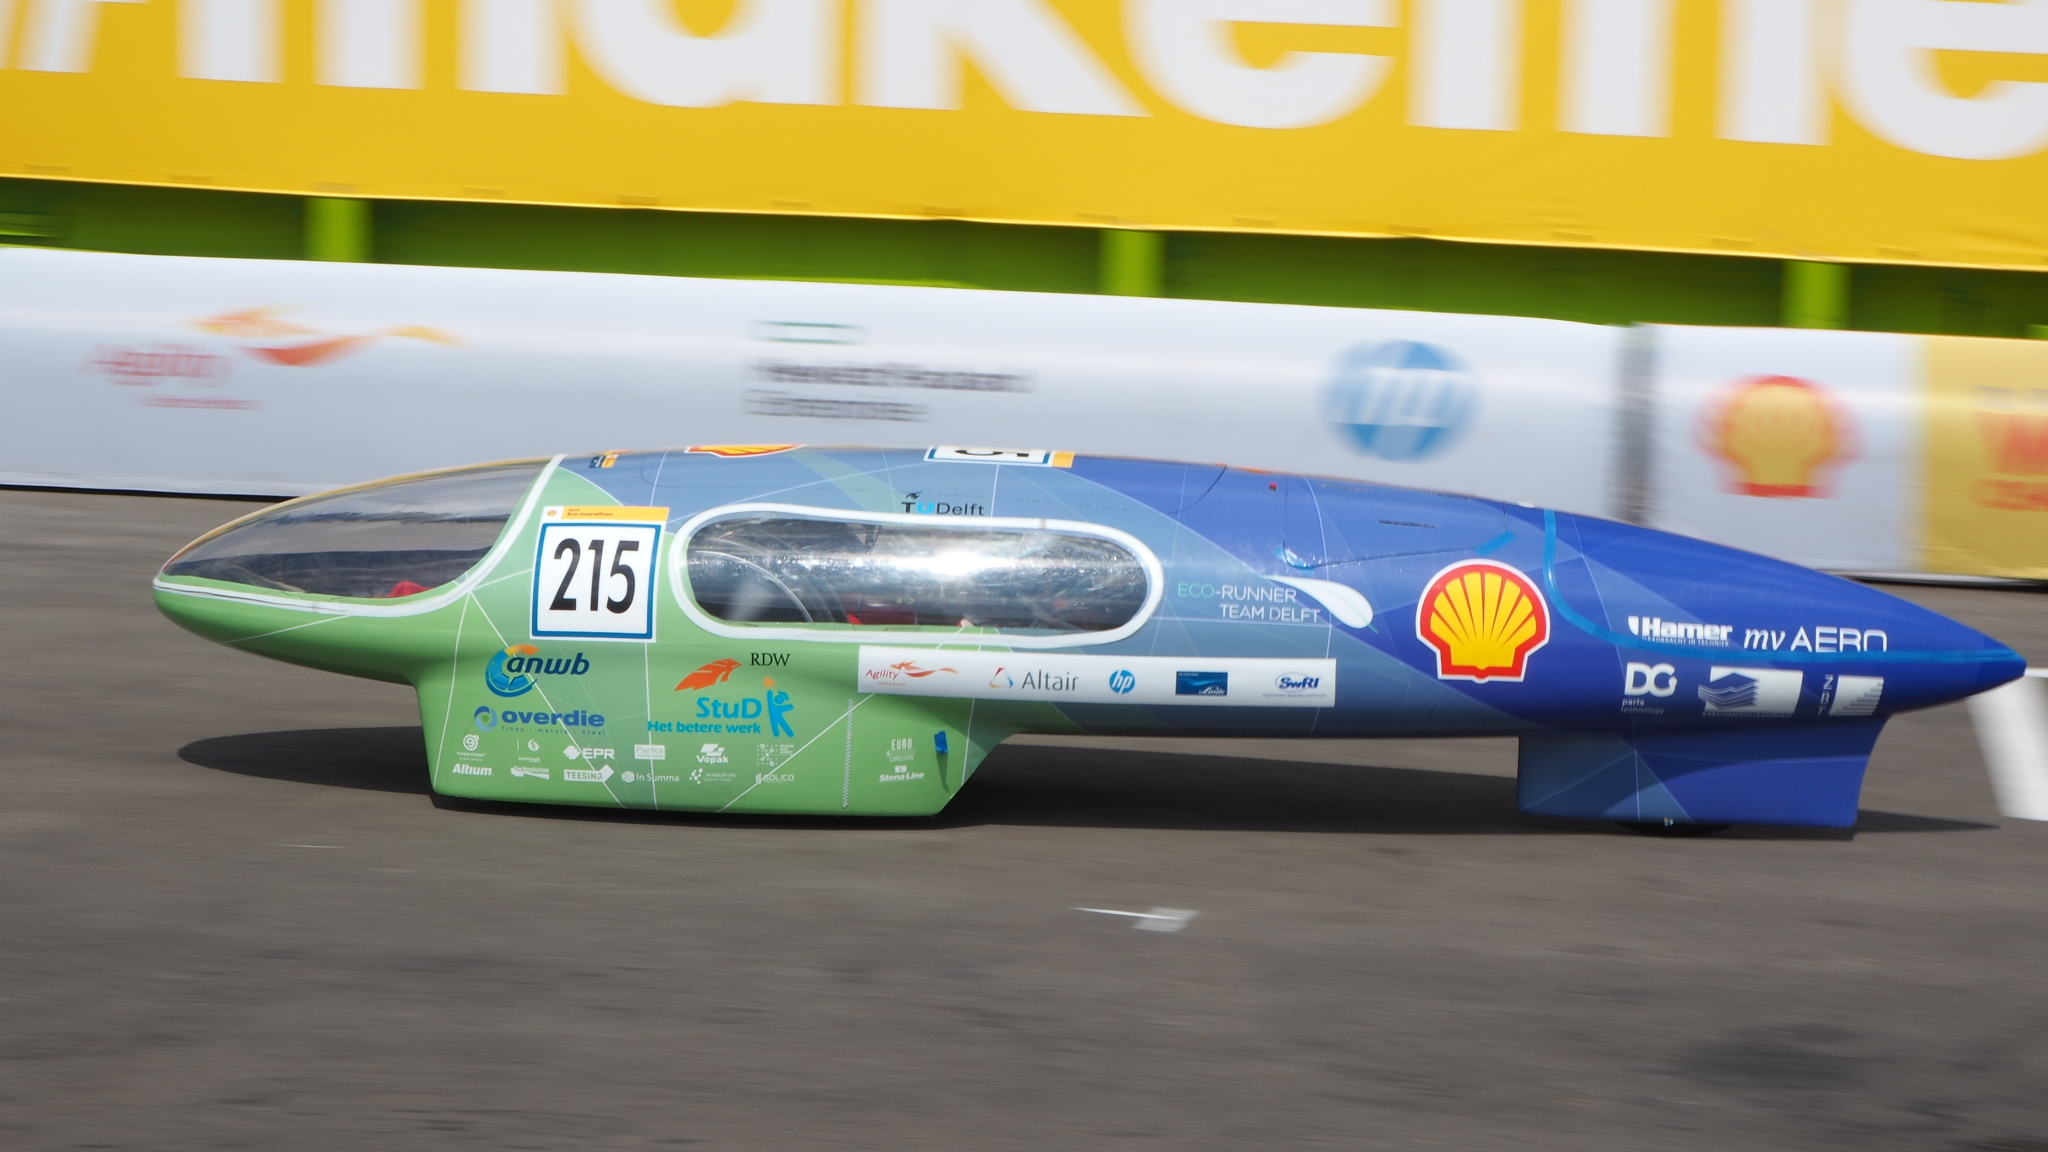 eco runner jobs in energy